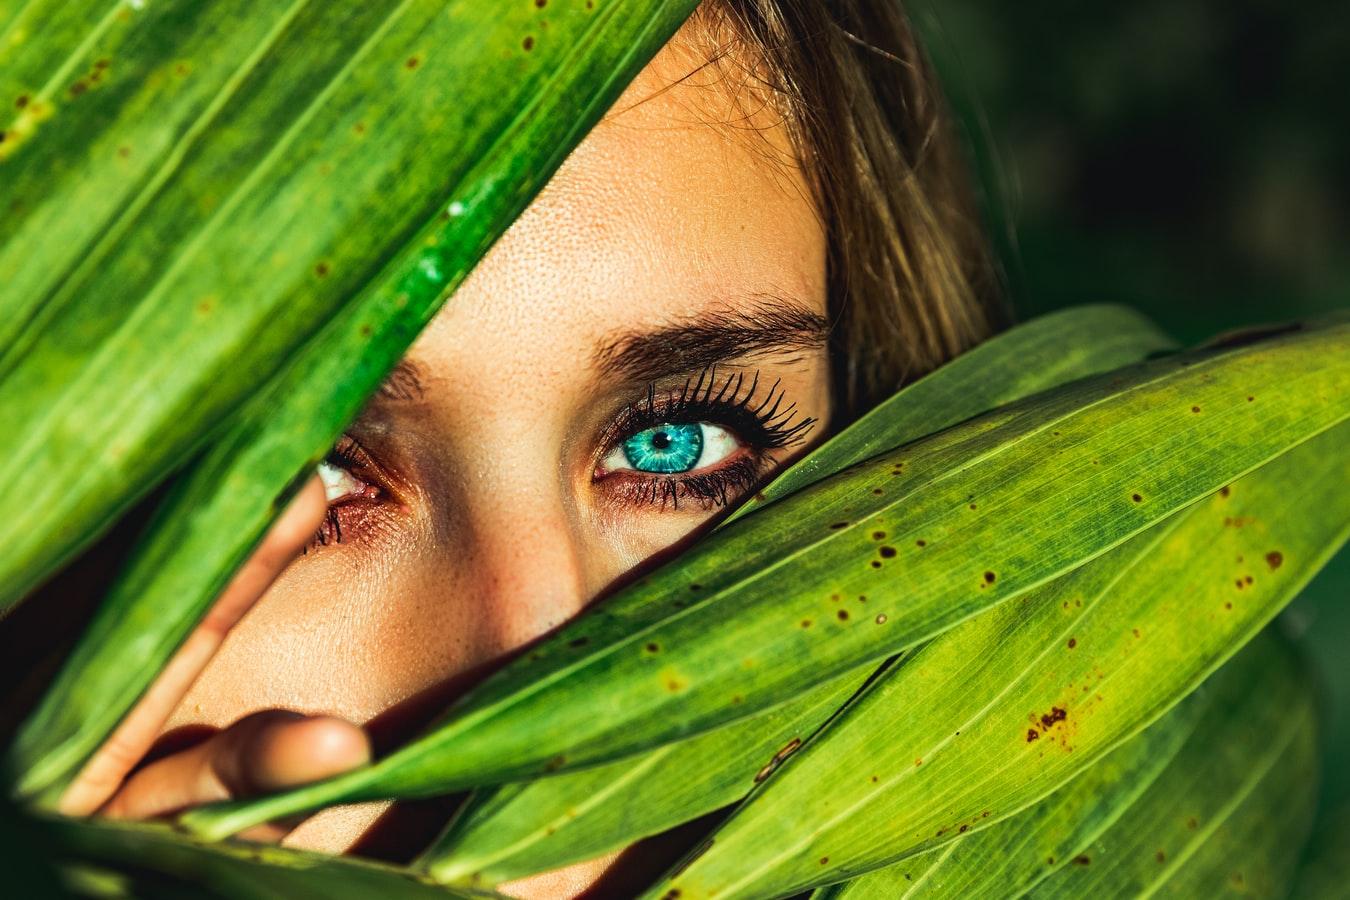 An very photogenic human eye